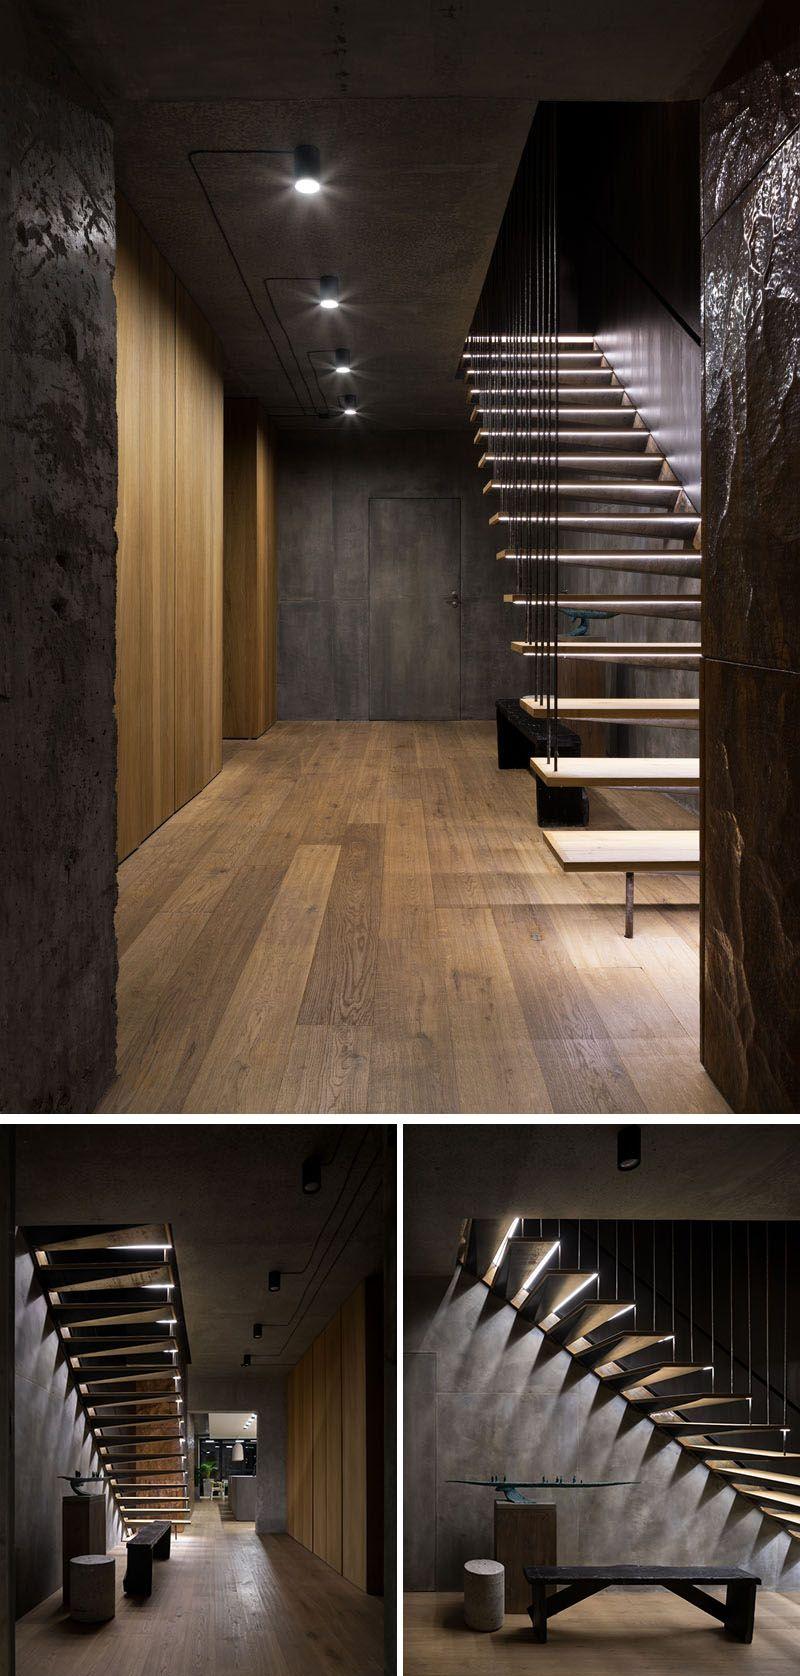 Sergey makhno has designed a modern apartment interior in - Florida building code interior walls ...